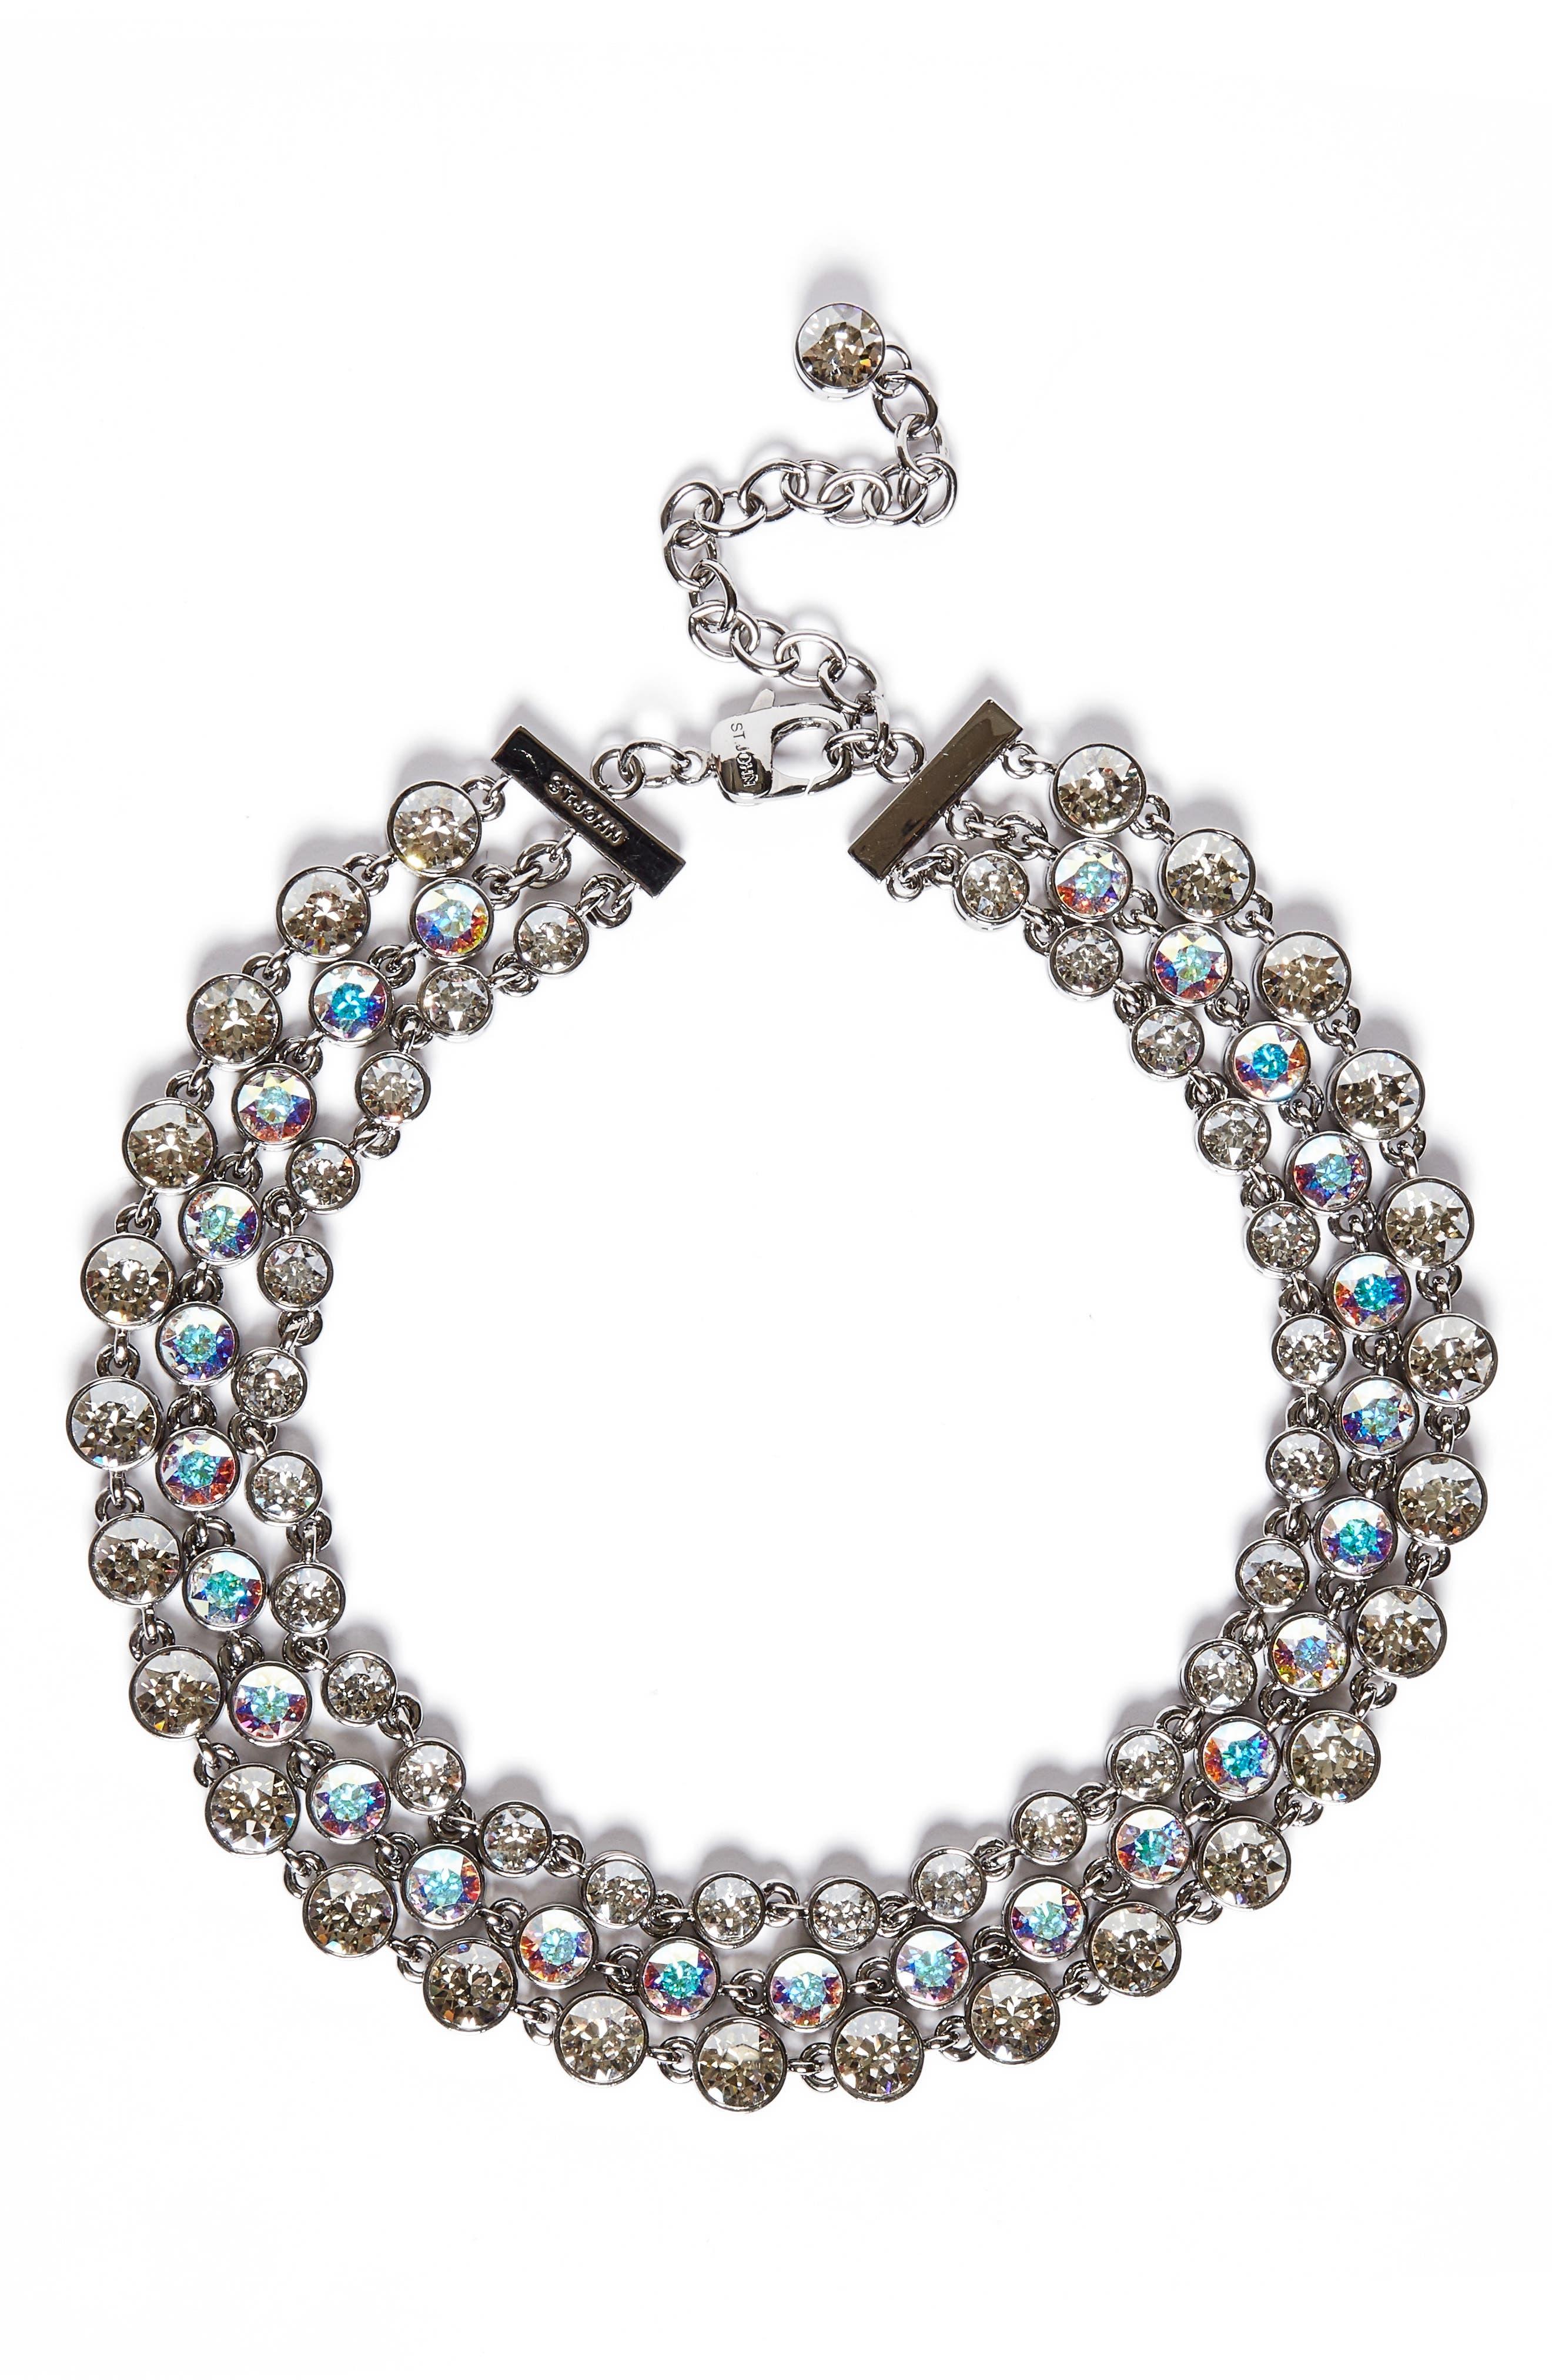 Swarovski Crystal Collar Necklace,                             Main thumbnail 1, color,                             040